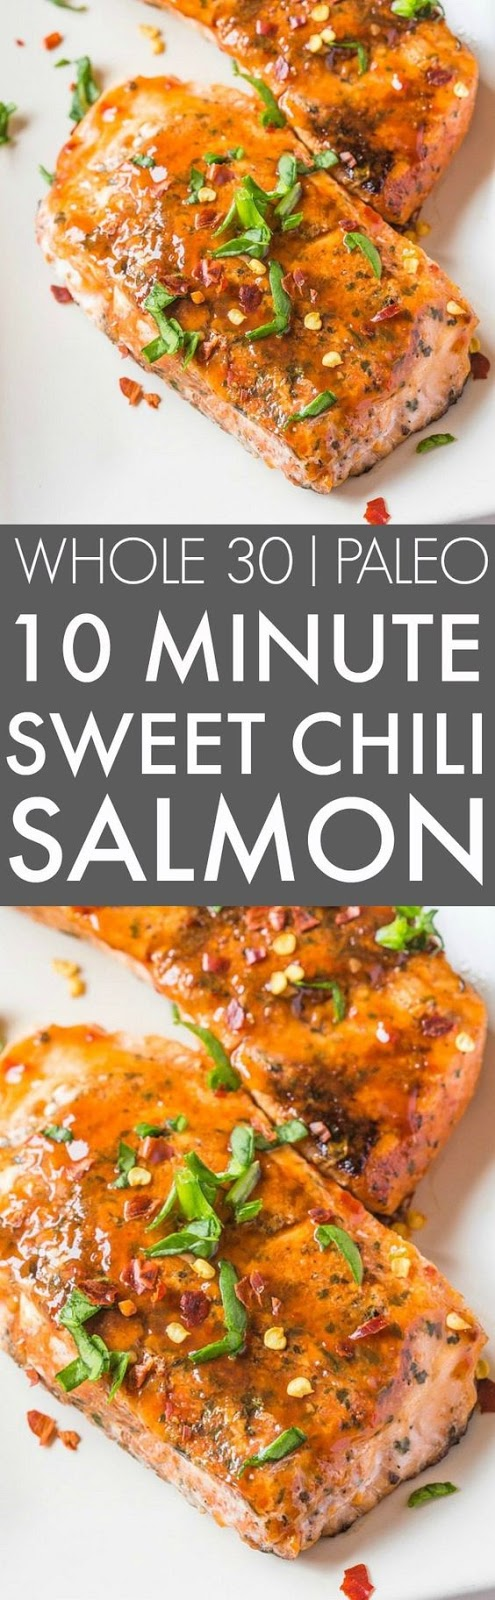 Easy Sweet Chilli Salmon